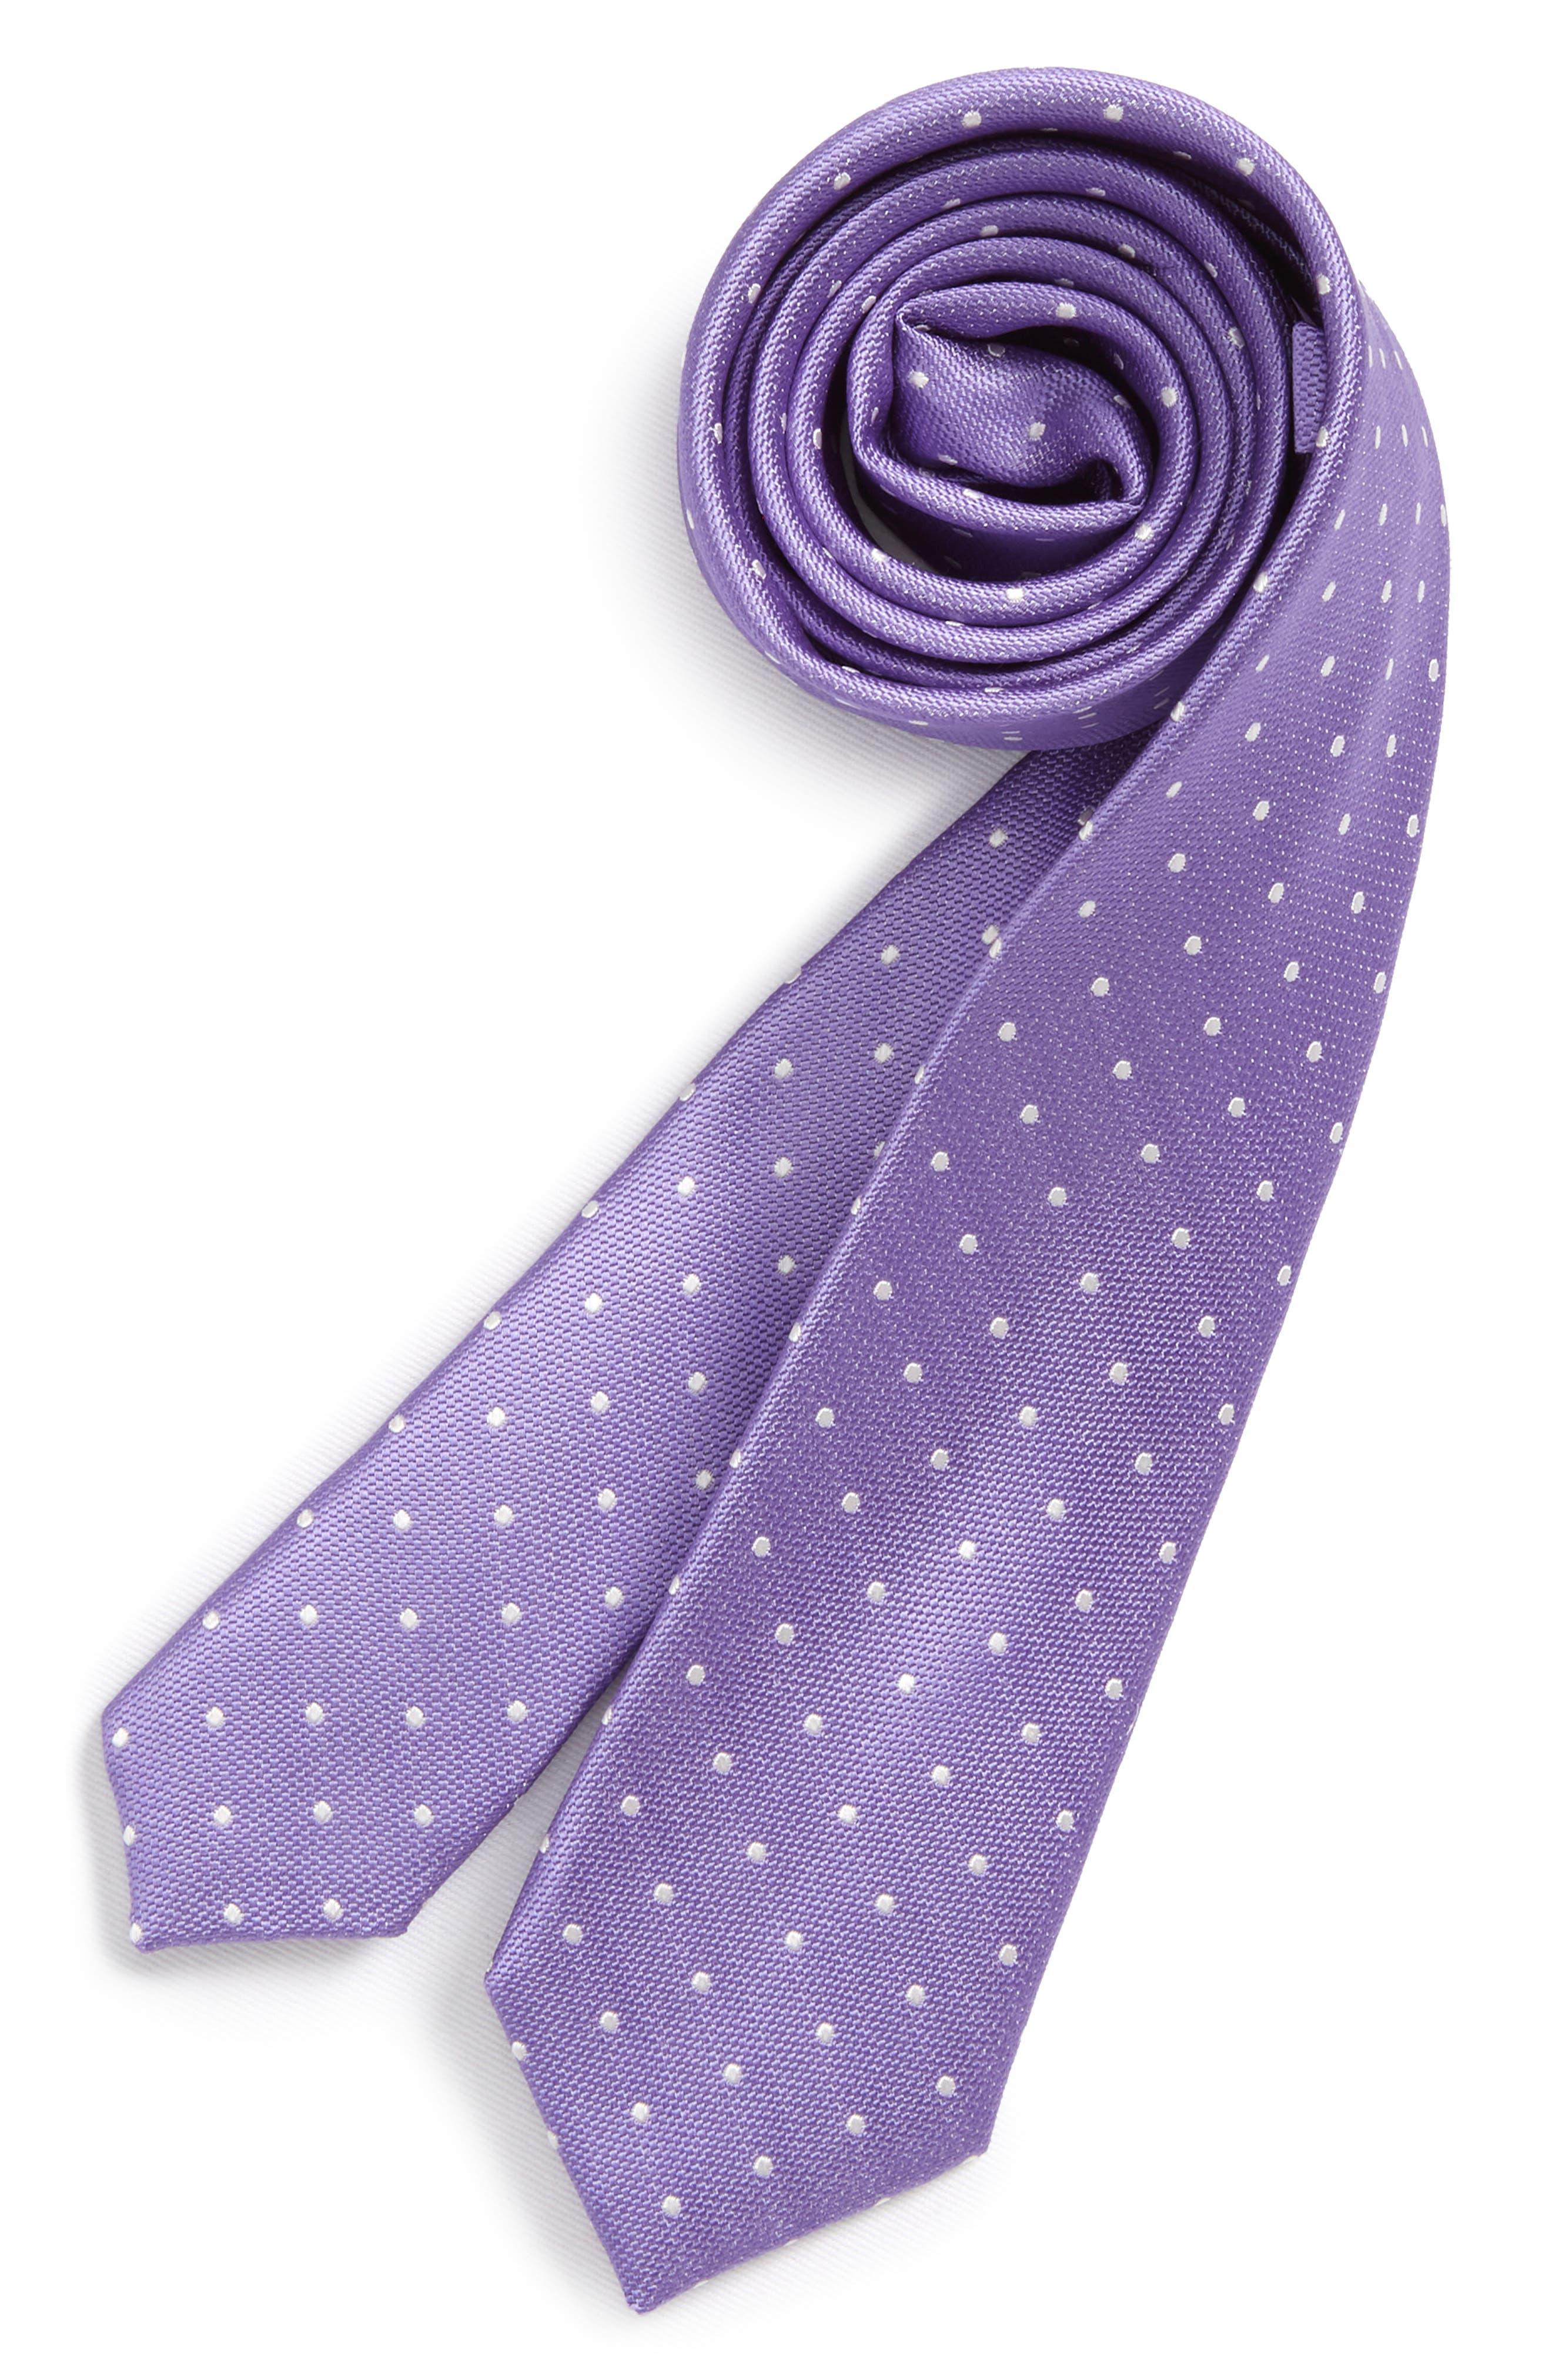 Dainty Dot Silk Tie,                         Main,                         color, 500